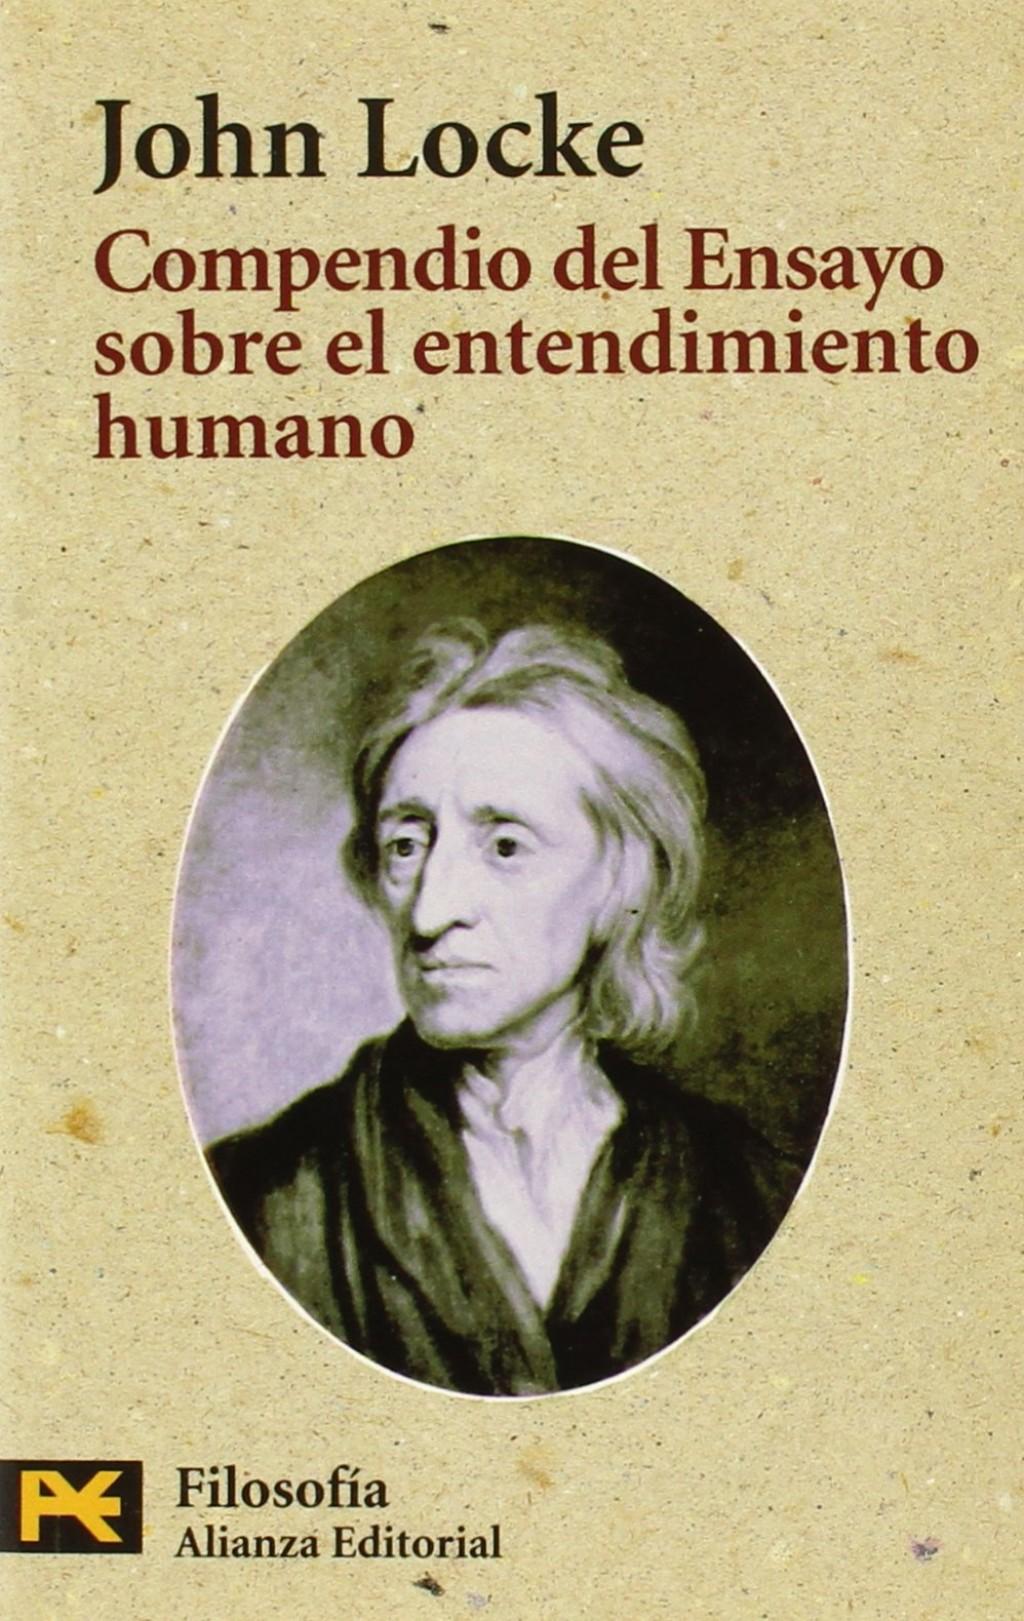 015 81o8ox7lzpl John Locke Essay Impressive Concerning Human Understanding Book 4 On Pdf Summary Large